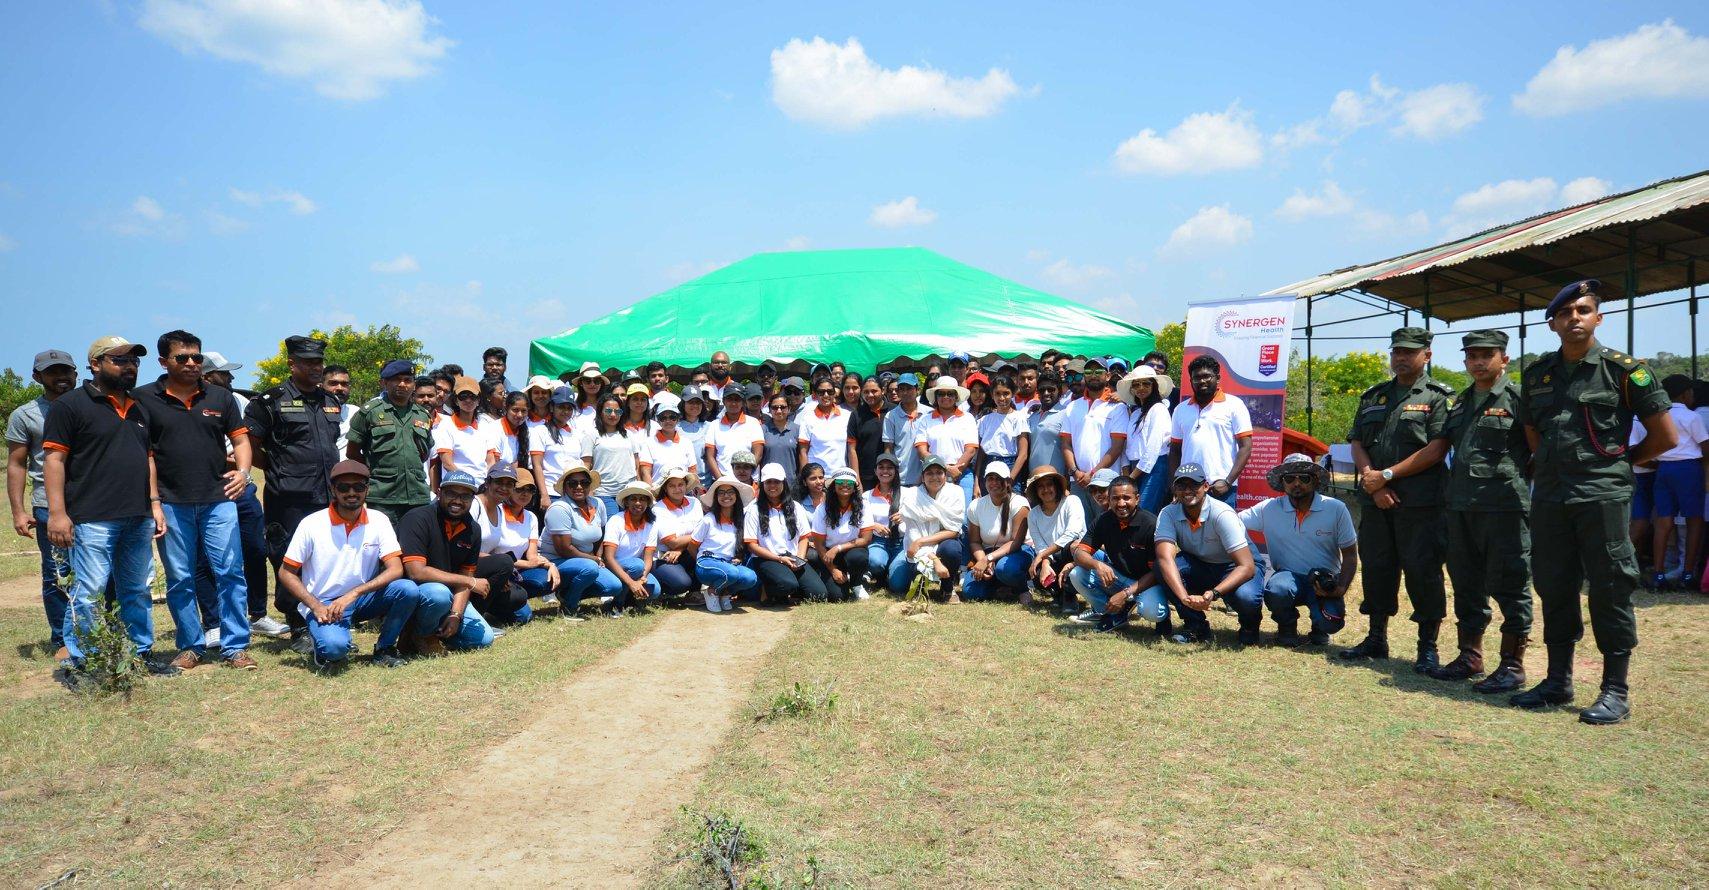 SYNERGEN Health - Earth Day Team